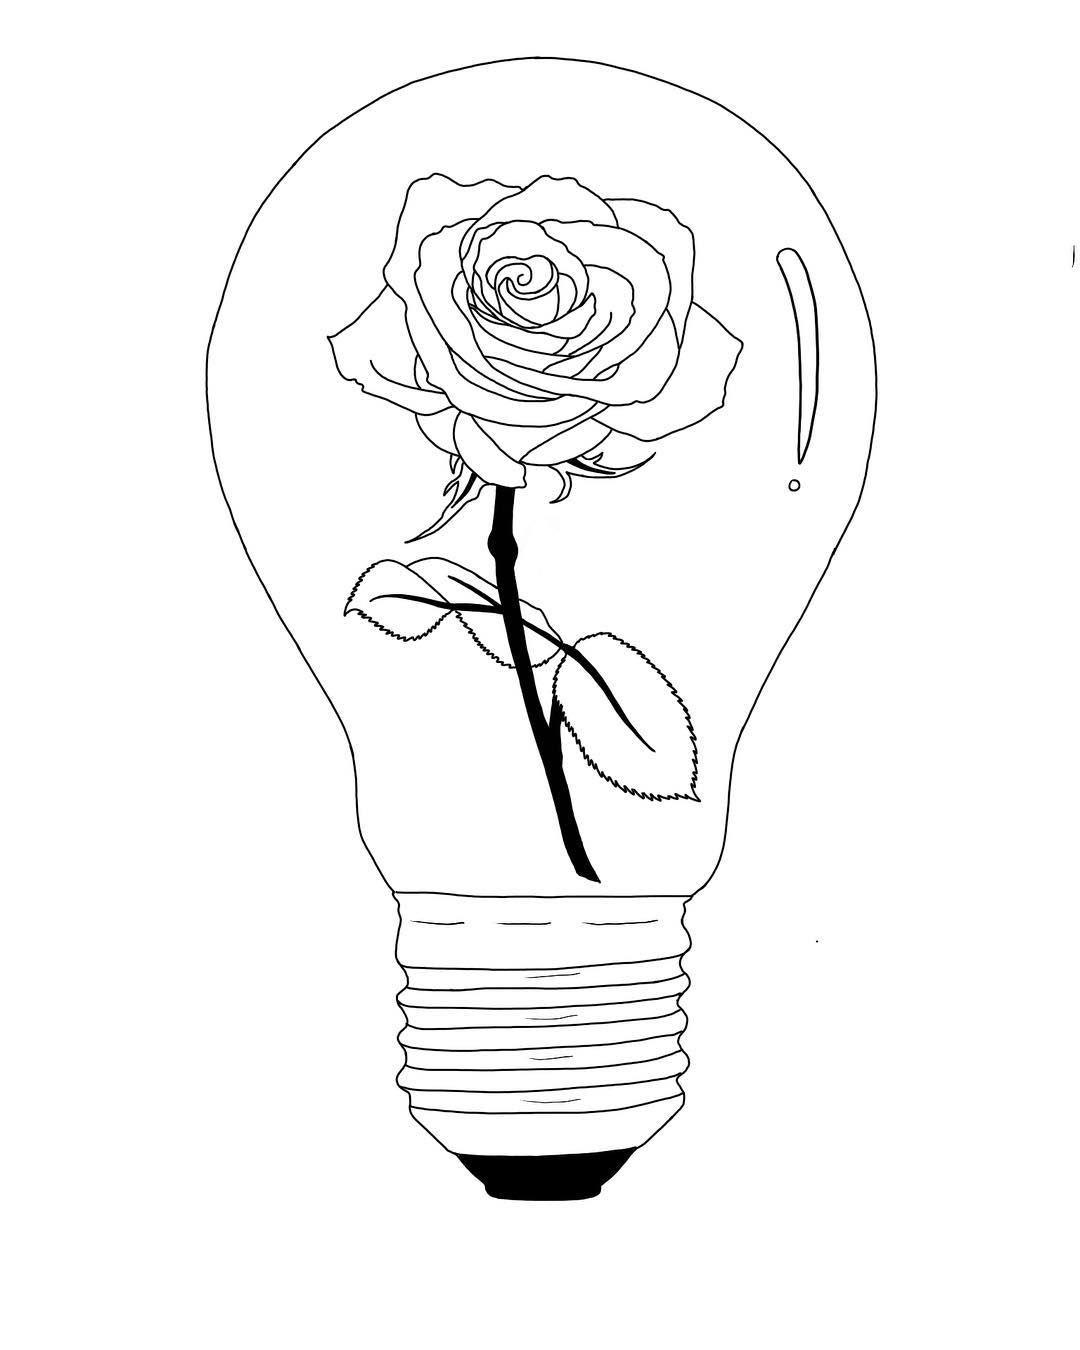 Ipadpro Drawing Ipadprocreate Applepencil